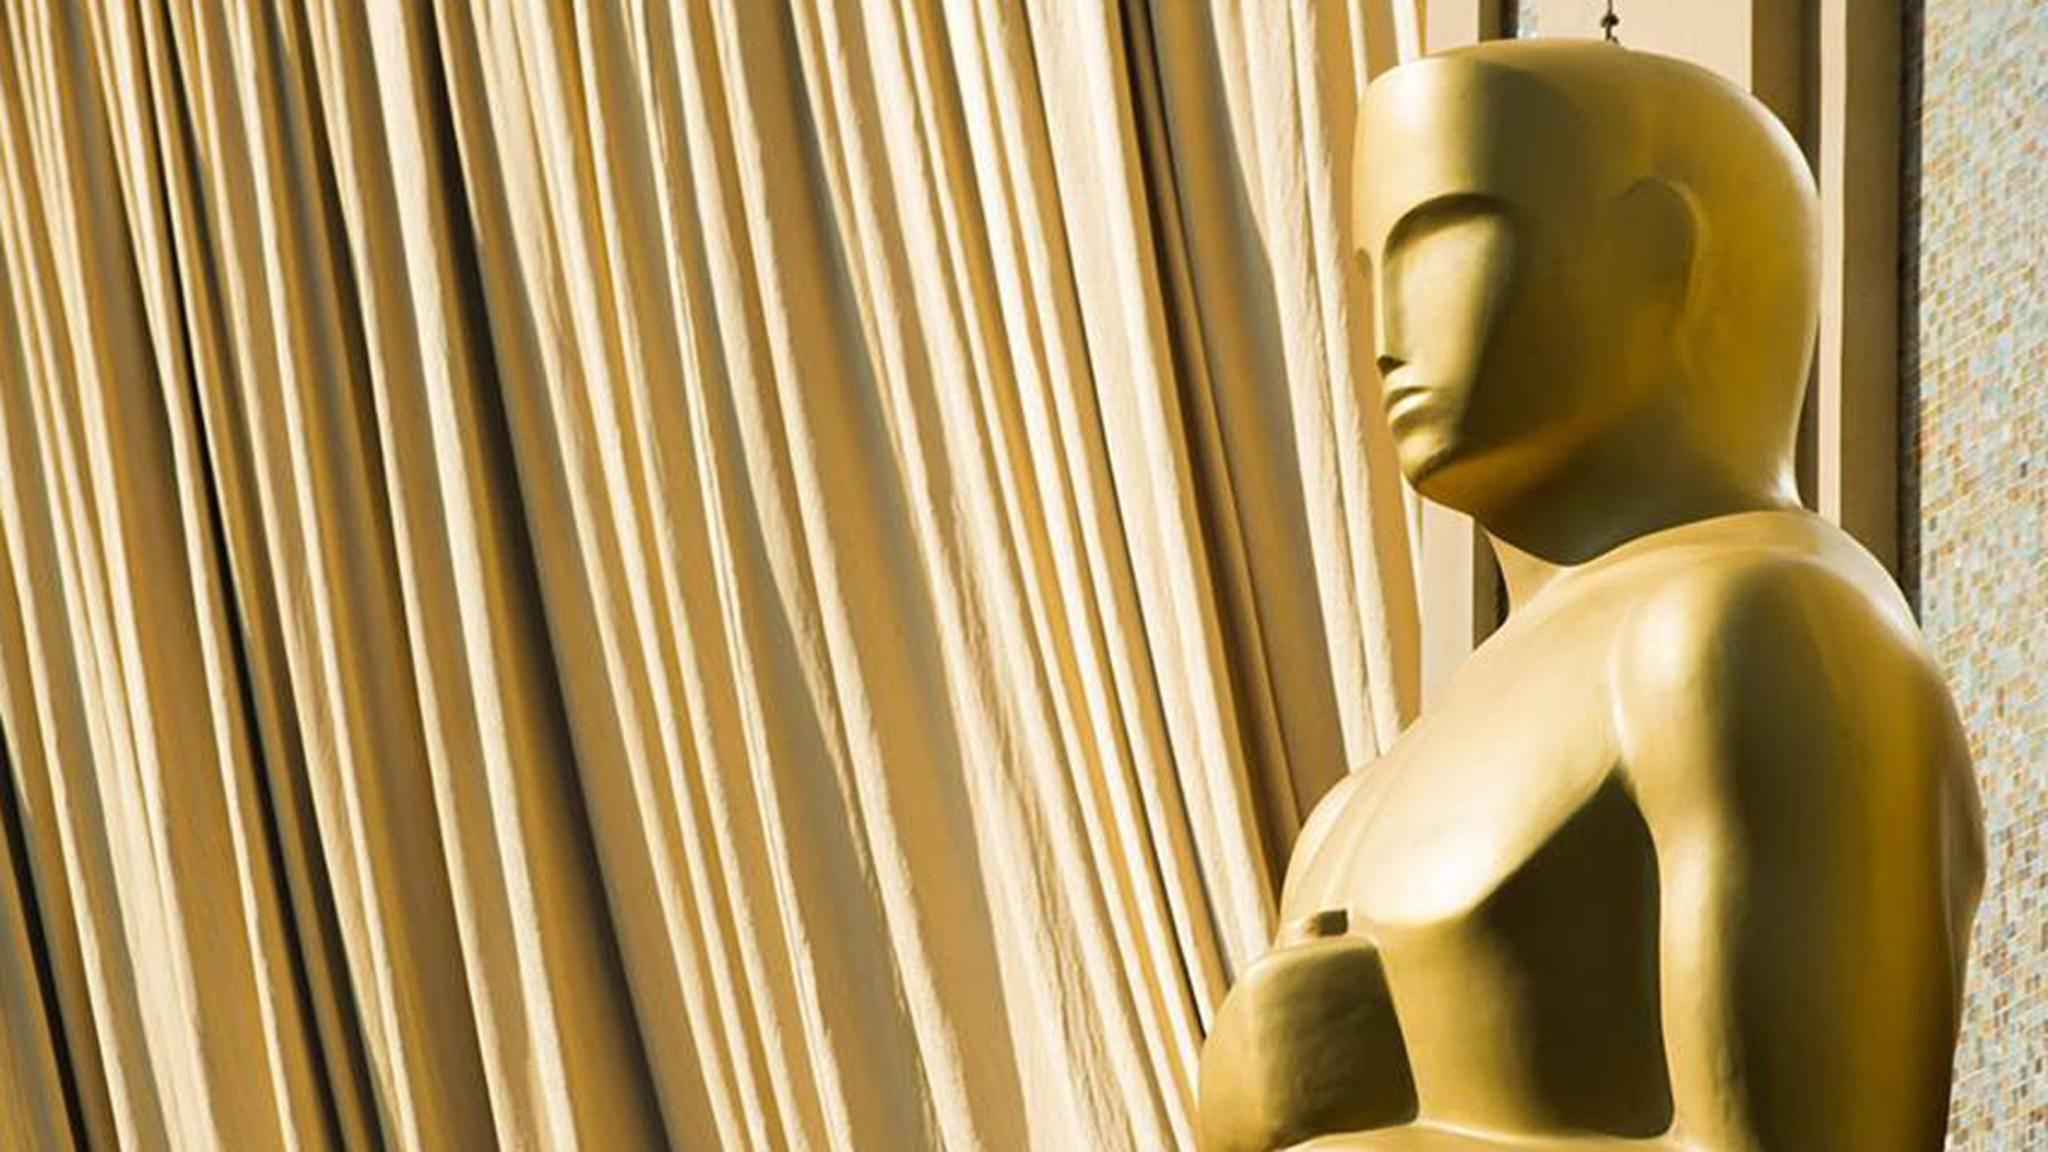 Am Ende bleibt bei den Oscars wohl doch besser alles beim Alten ...